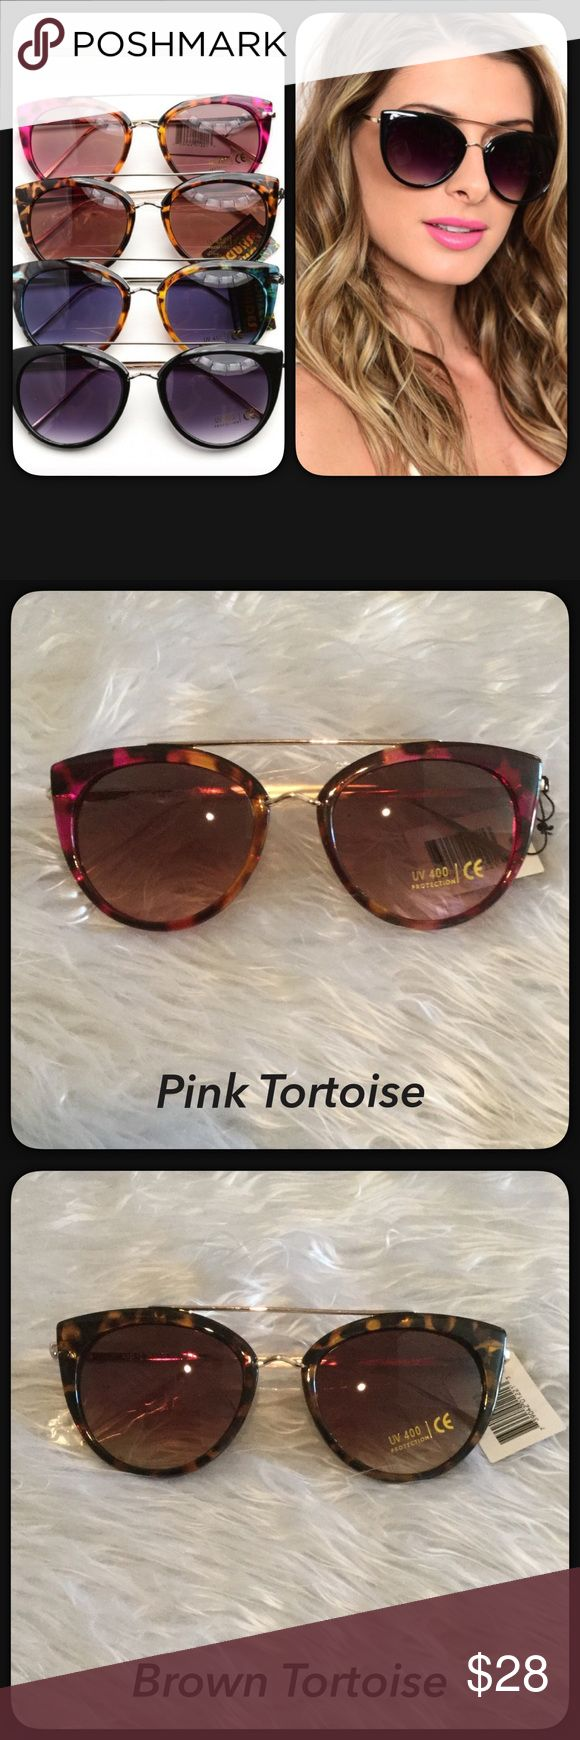 SunglassesCat Eye Sunglasses Óculos de sol super fofos da Glam Vault. Grande reviravolta …   – My Posh Picks